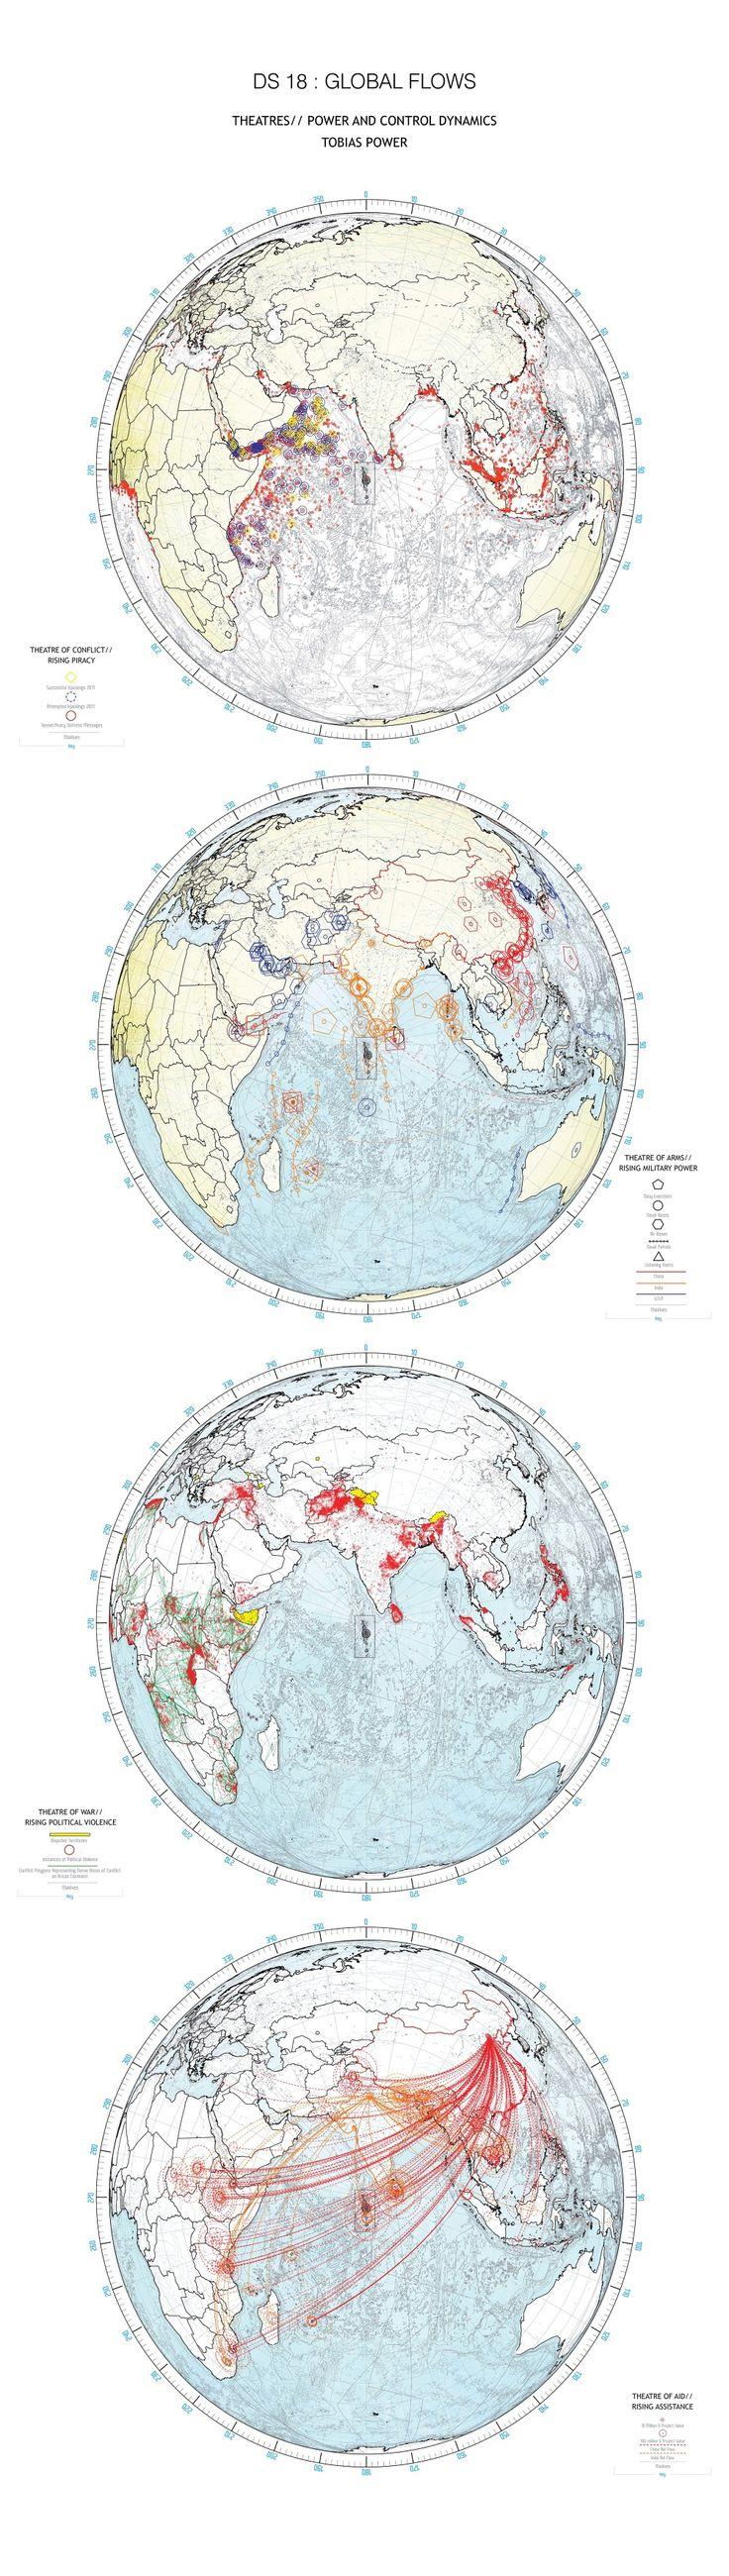 Global Flows u2013u2013u2013u2013u2013u2013 University of Westminster Second